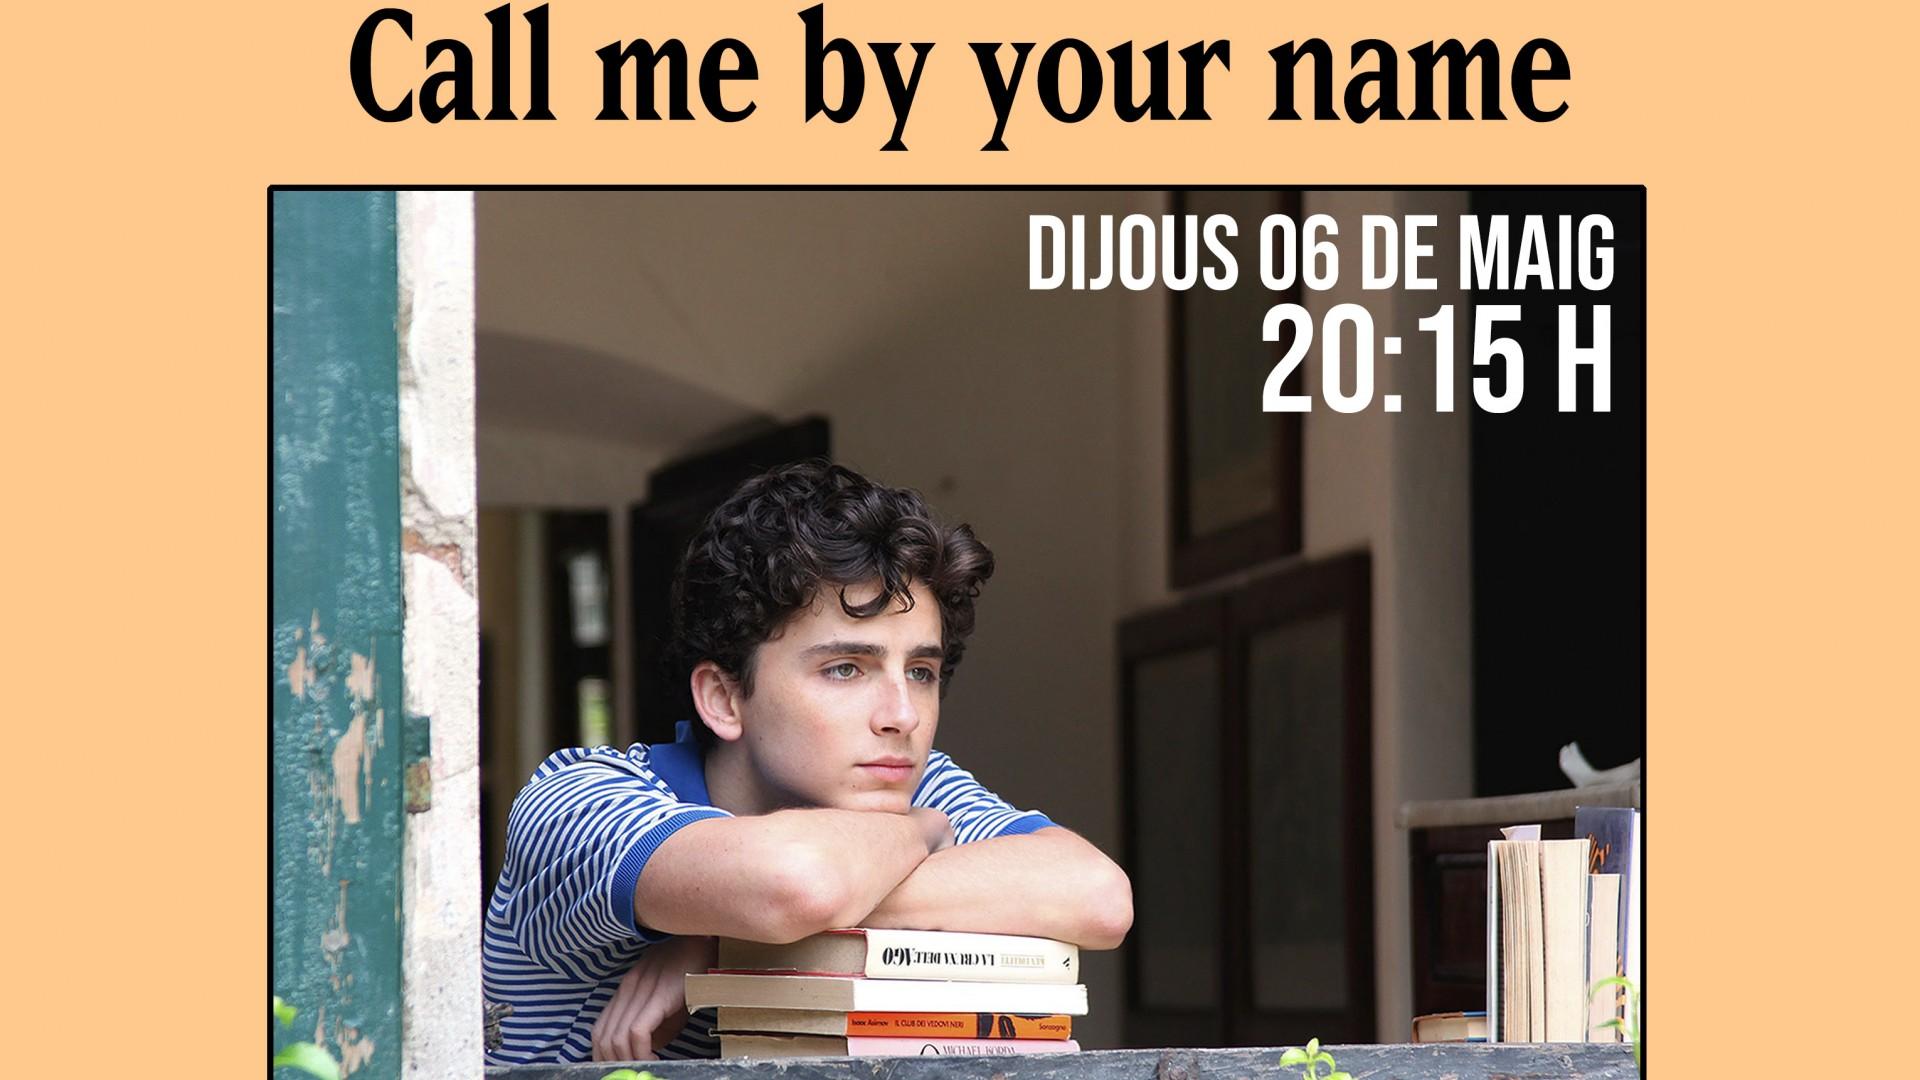 Programado por... Literatura amb crispetes - Call me by your name